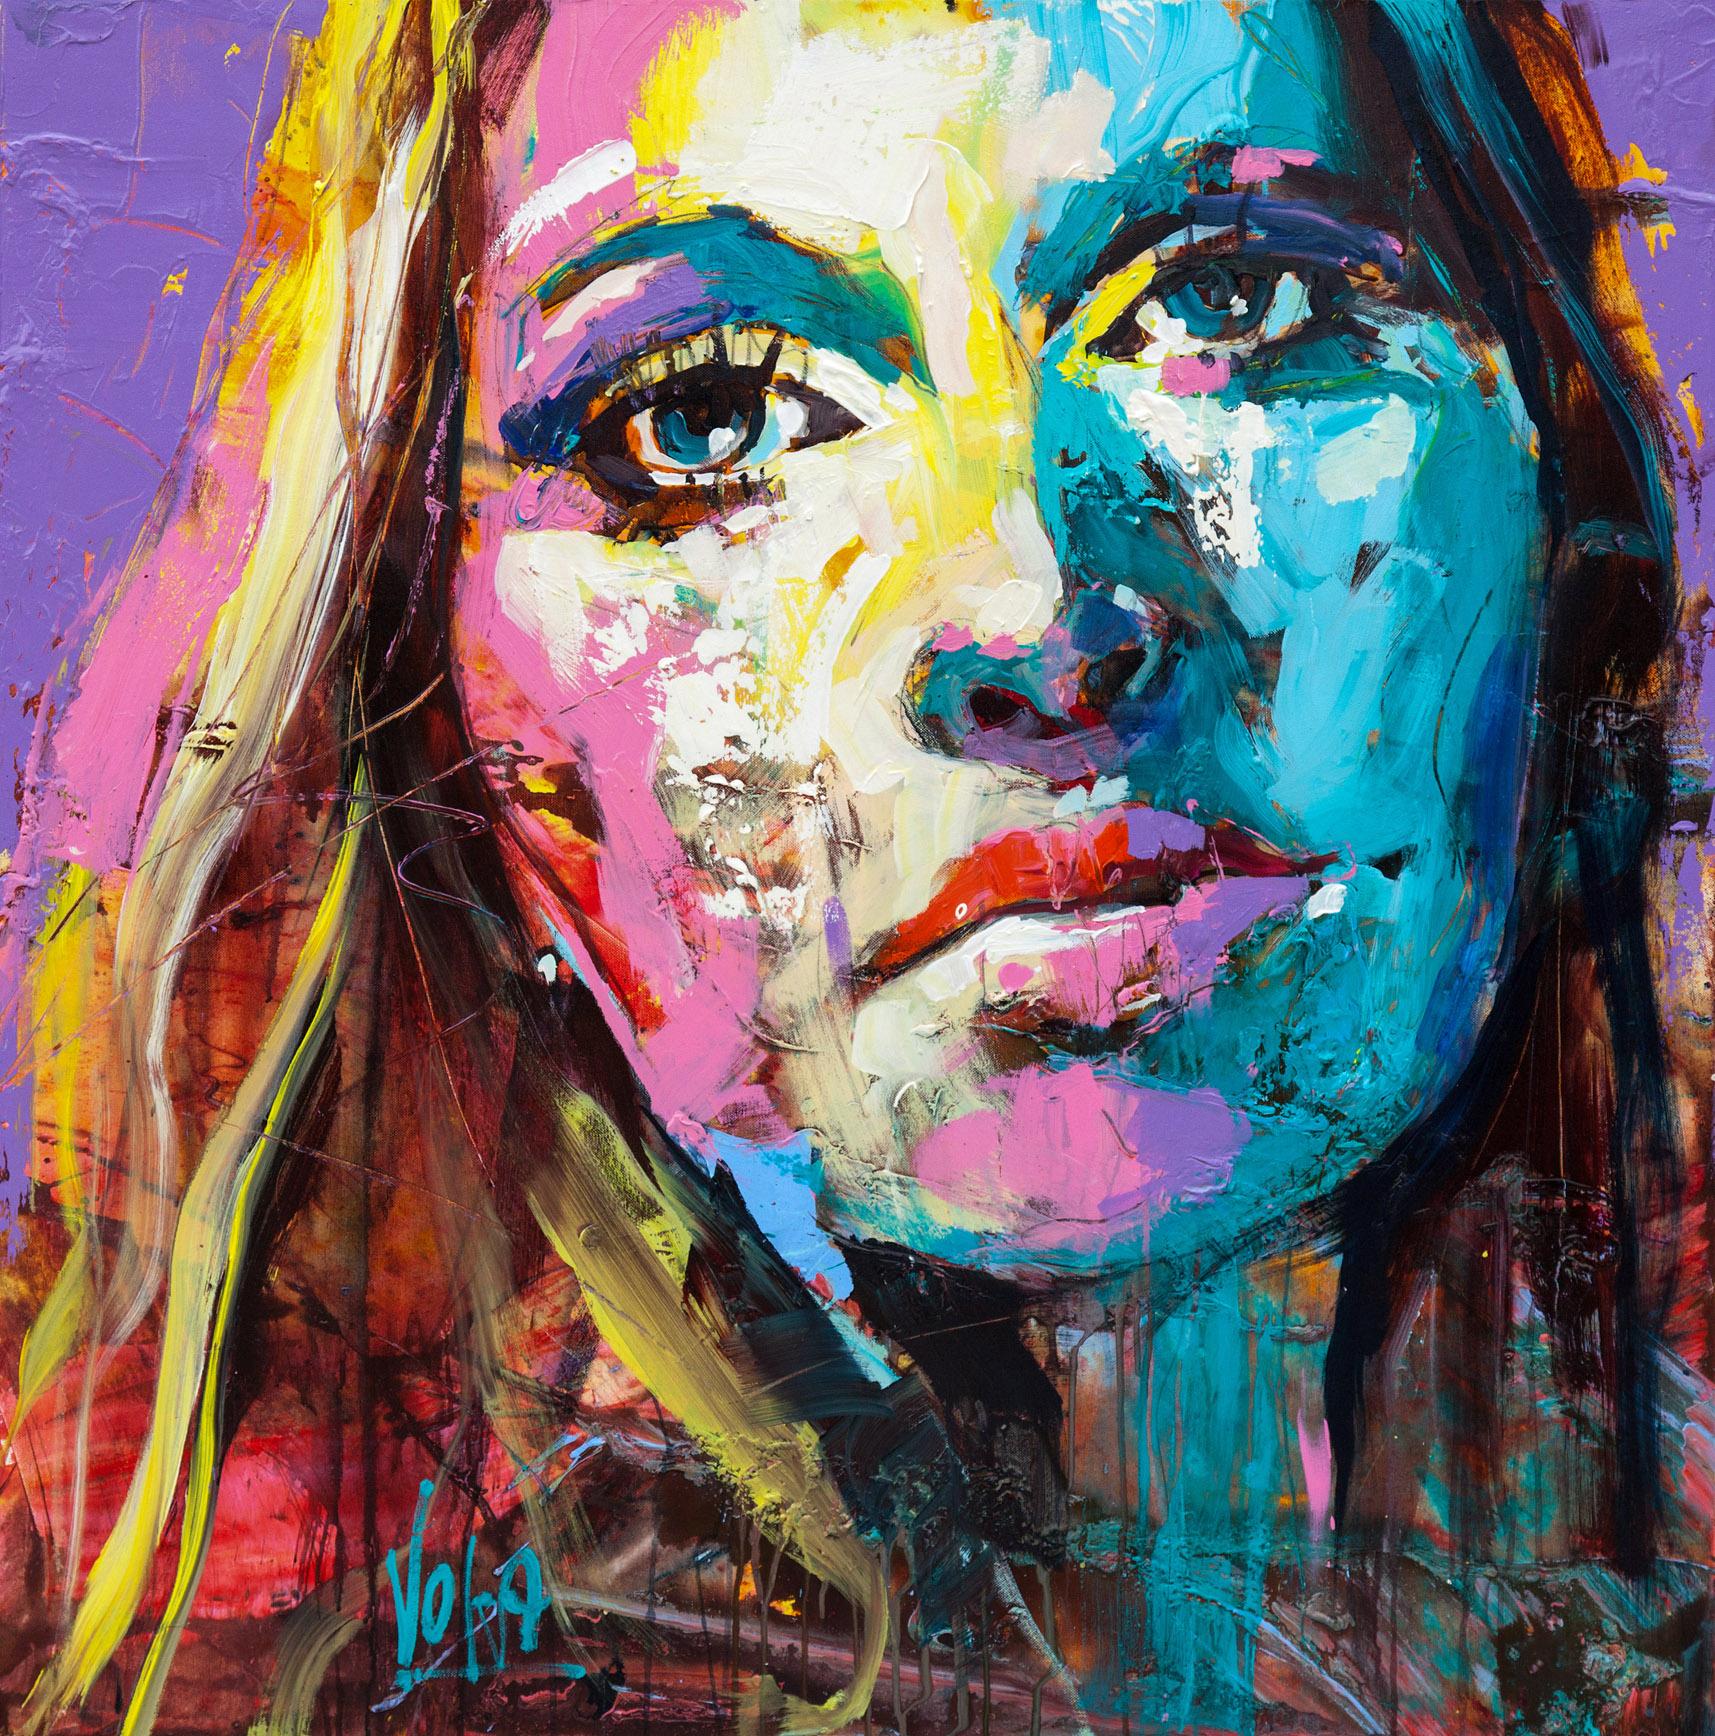 Head, 100x100 cm/39,4x39,4 inch, Acrylic on Canvas